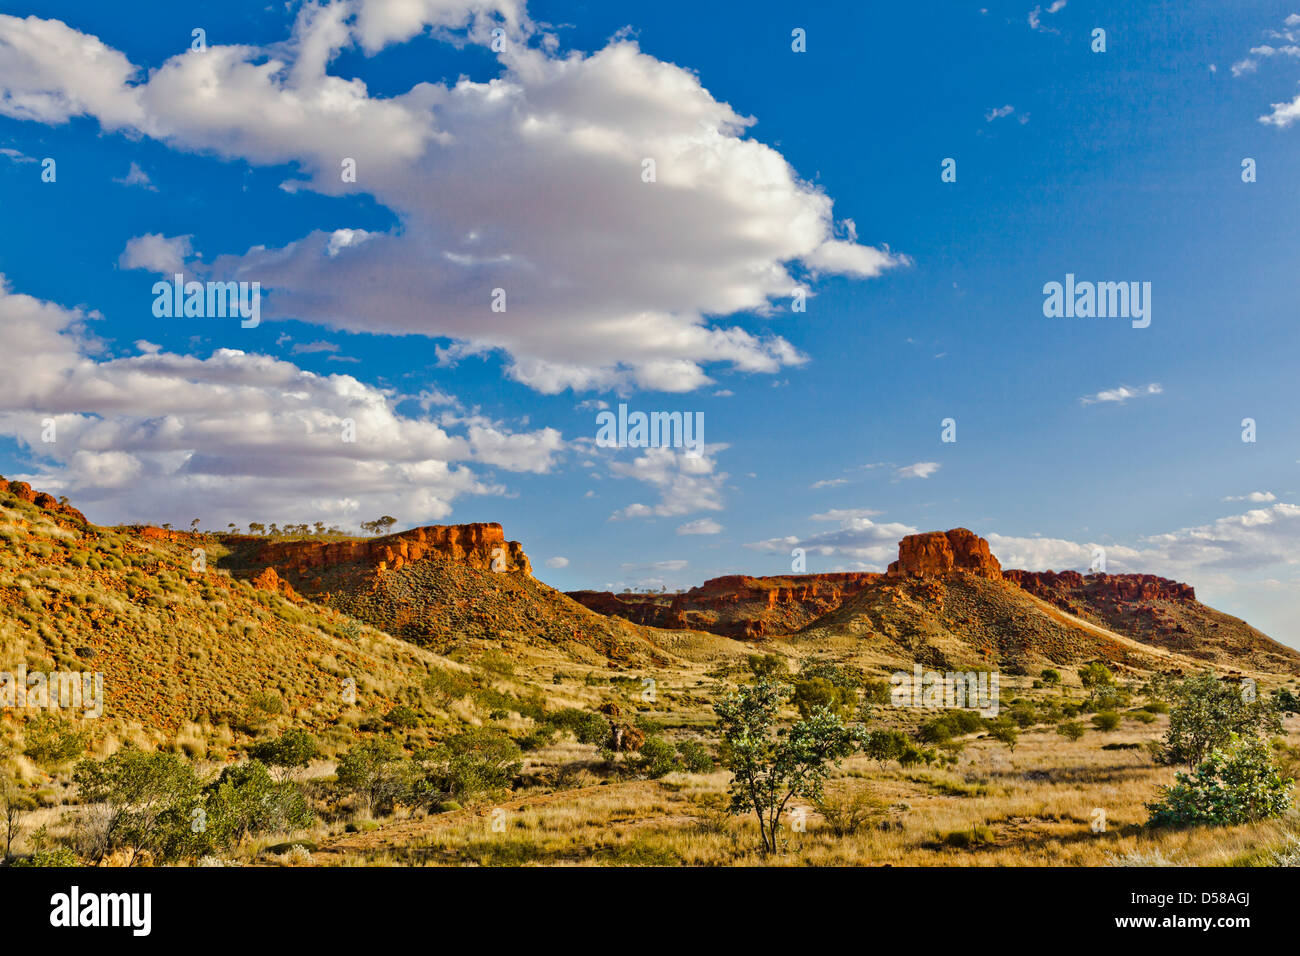 Australia, Western Australia, Kimberley, Great Northern Highway near Fitzroy Crossing Stock Photo